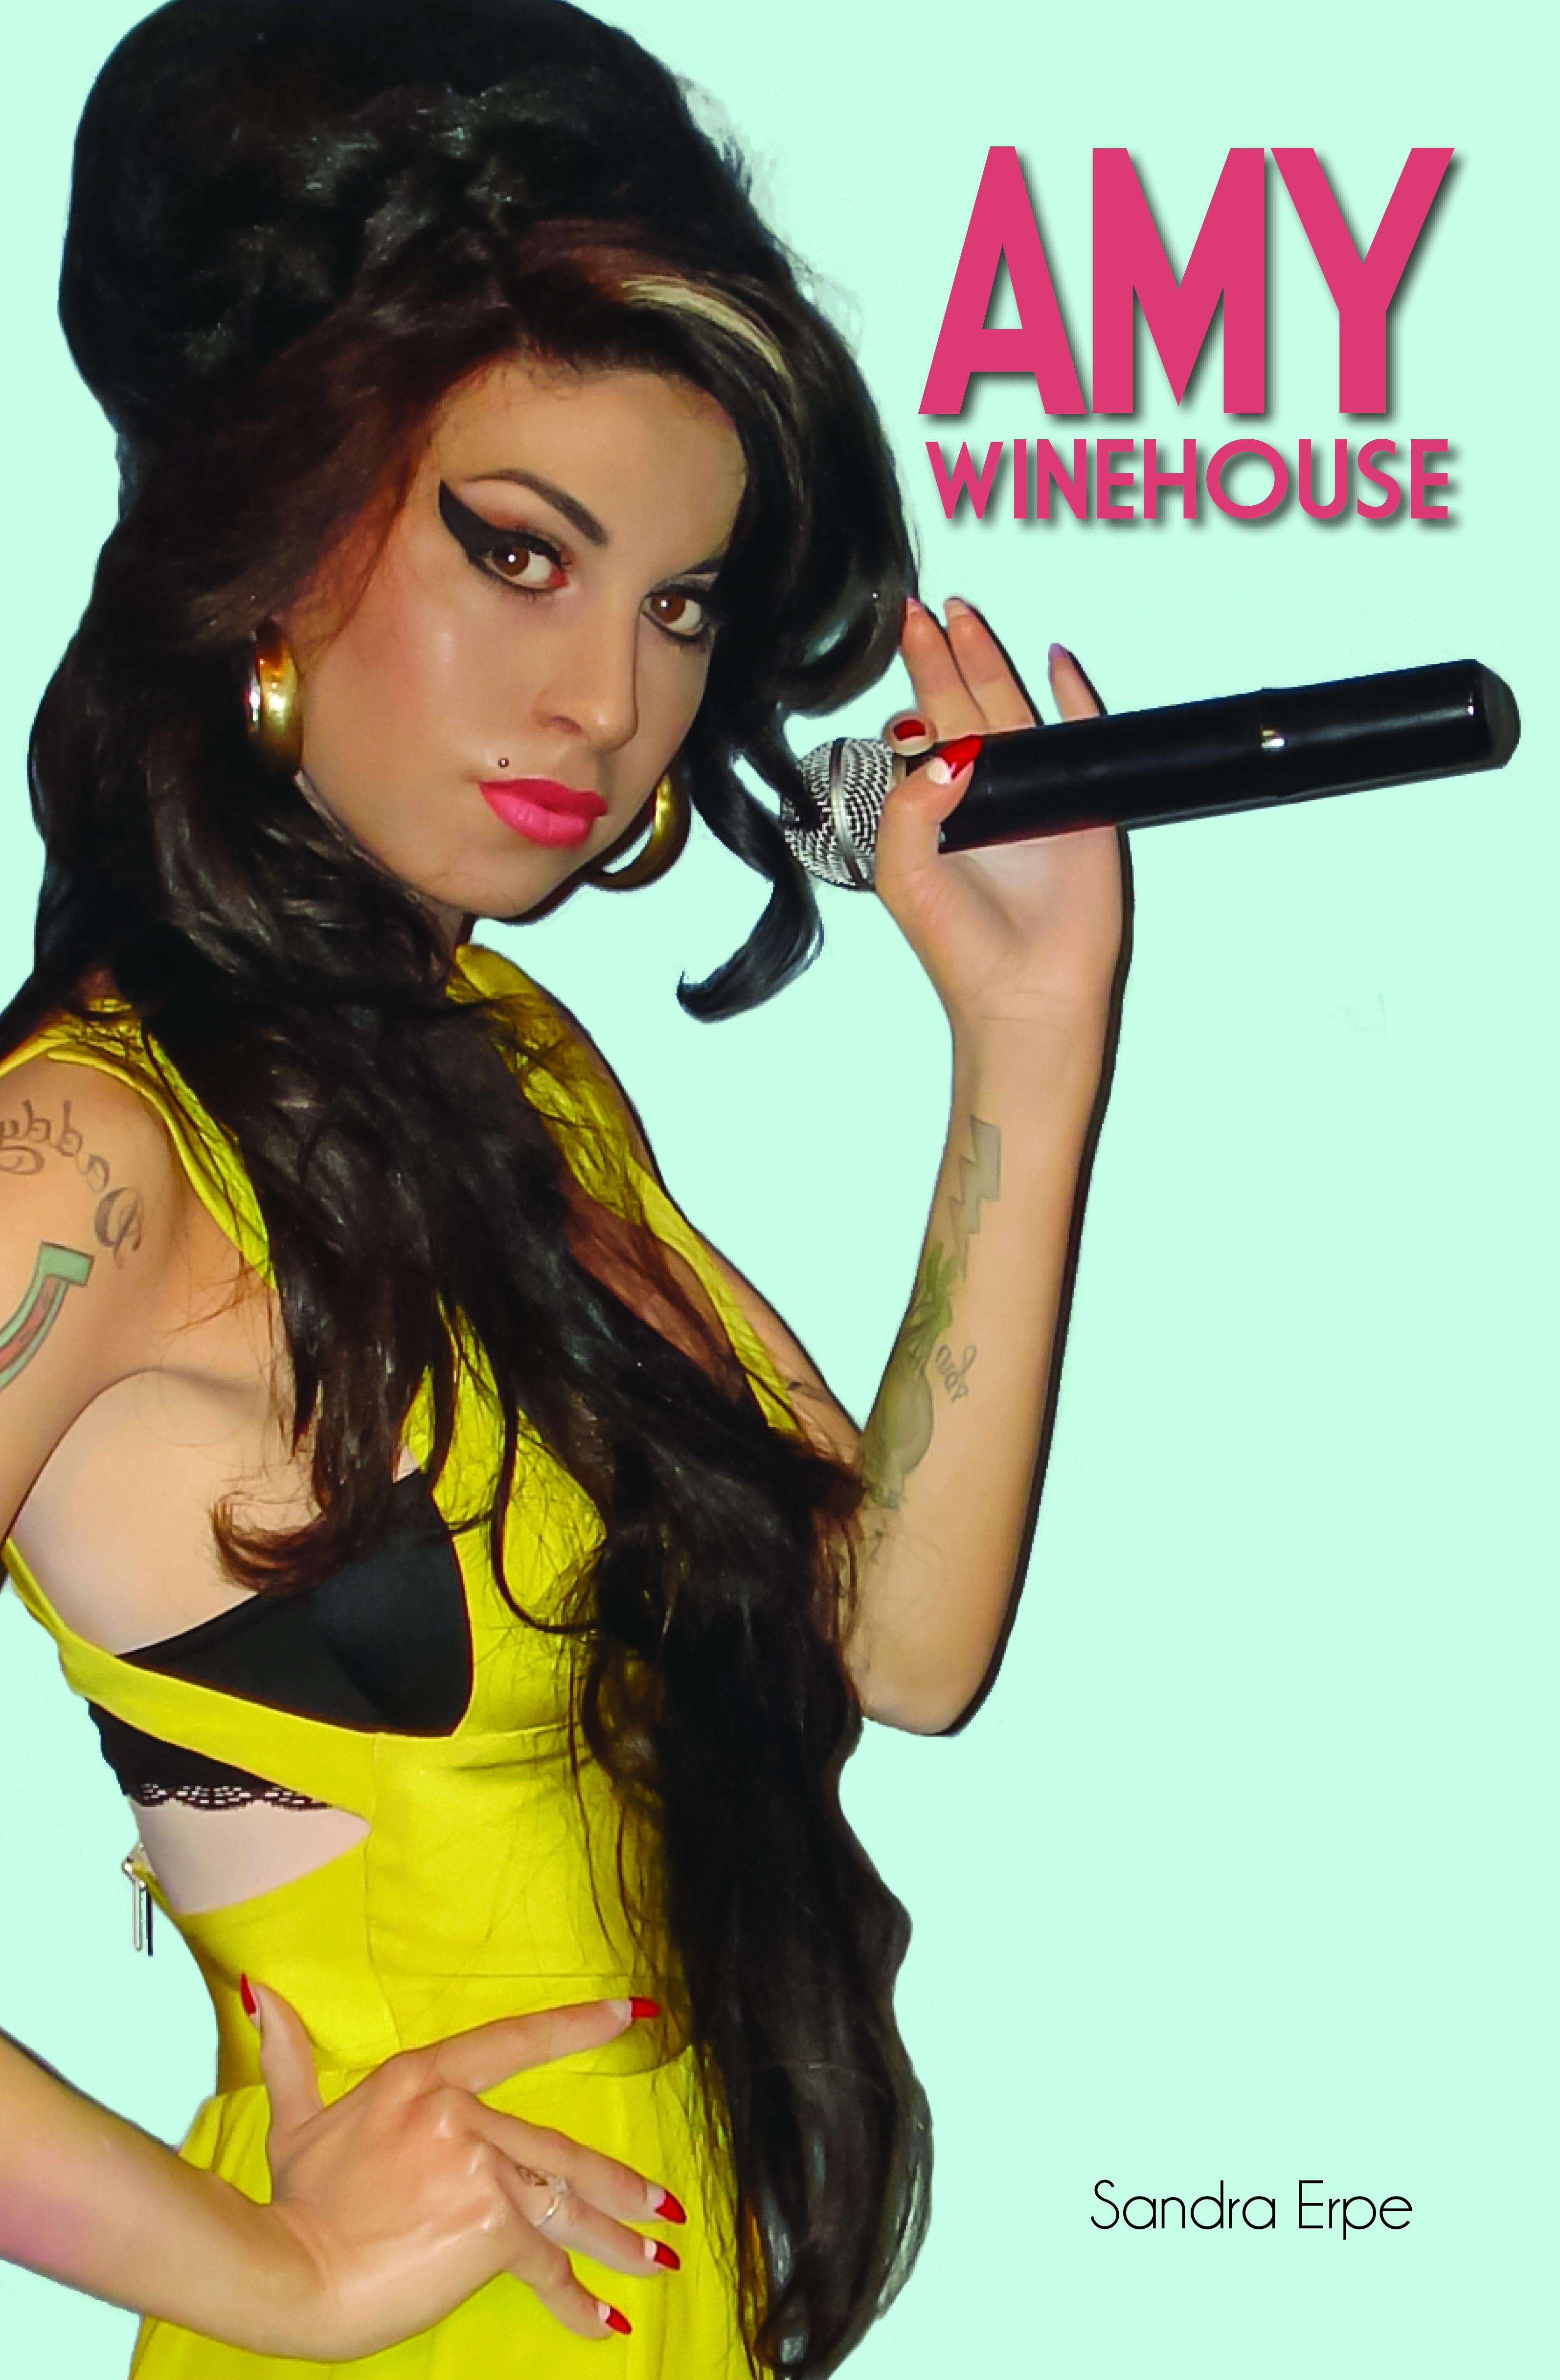 Amy-Winehouse-Sandra-Erpe-naslovnica